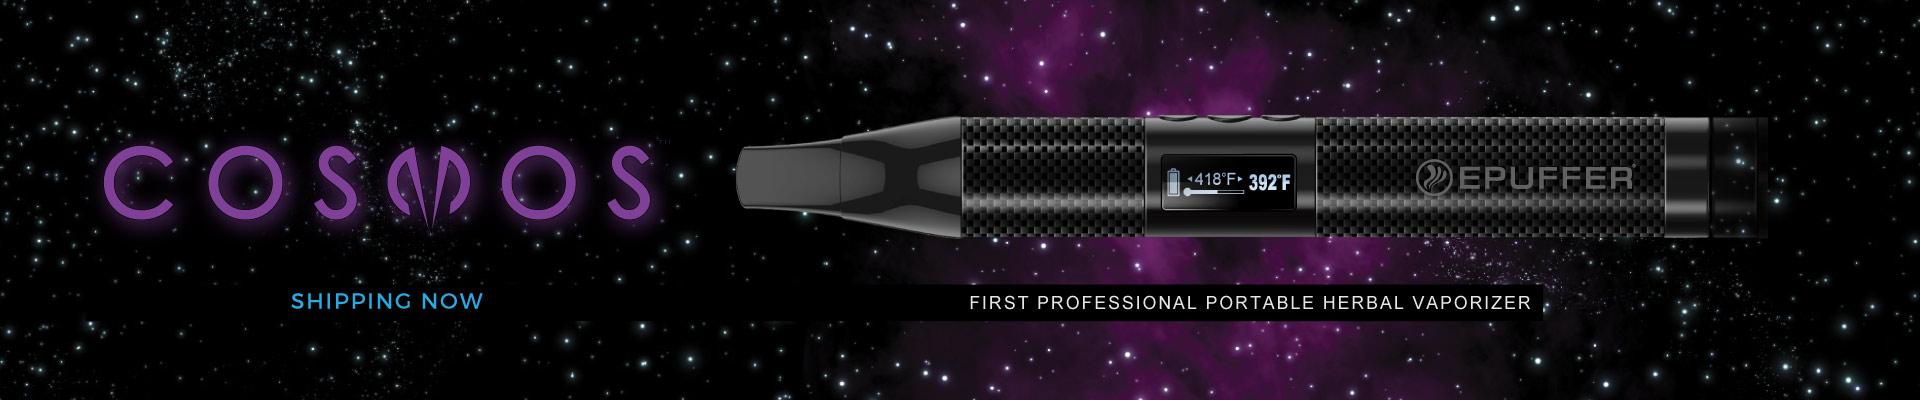 Cosmos dry-herb portable vaporizer